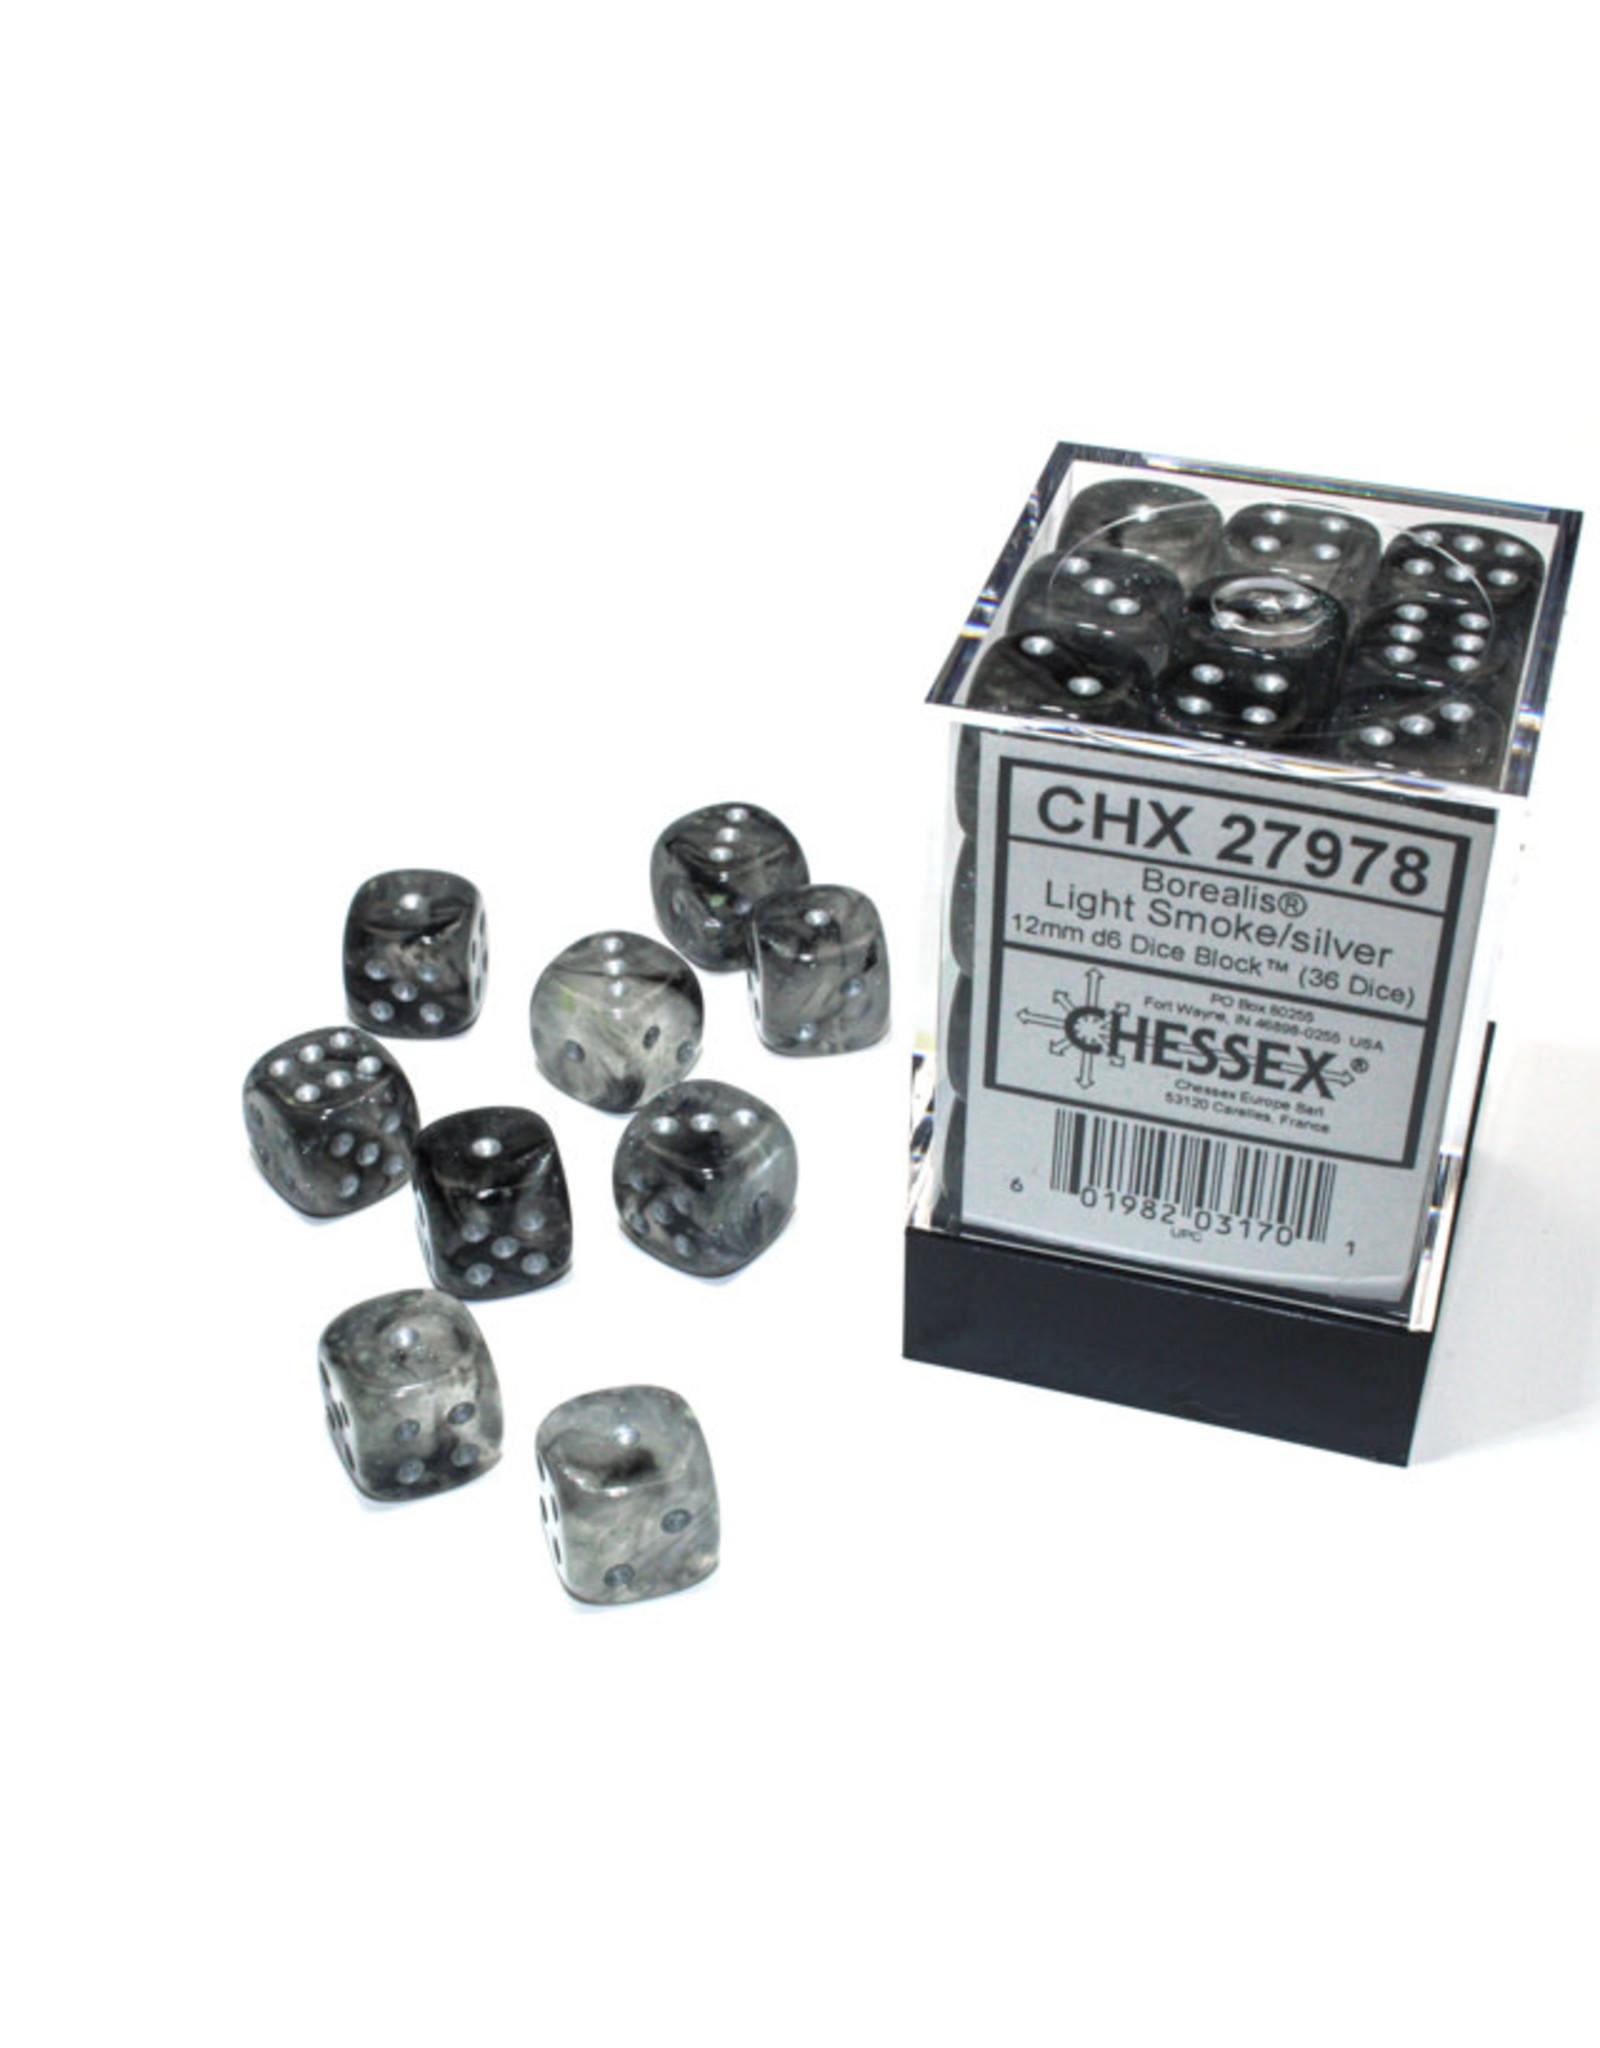 Chessex Borealis: 12mm d6 Light Smoke/silver Luminary Dice Block (36 dice) CHX27978